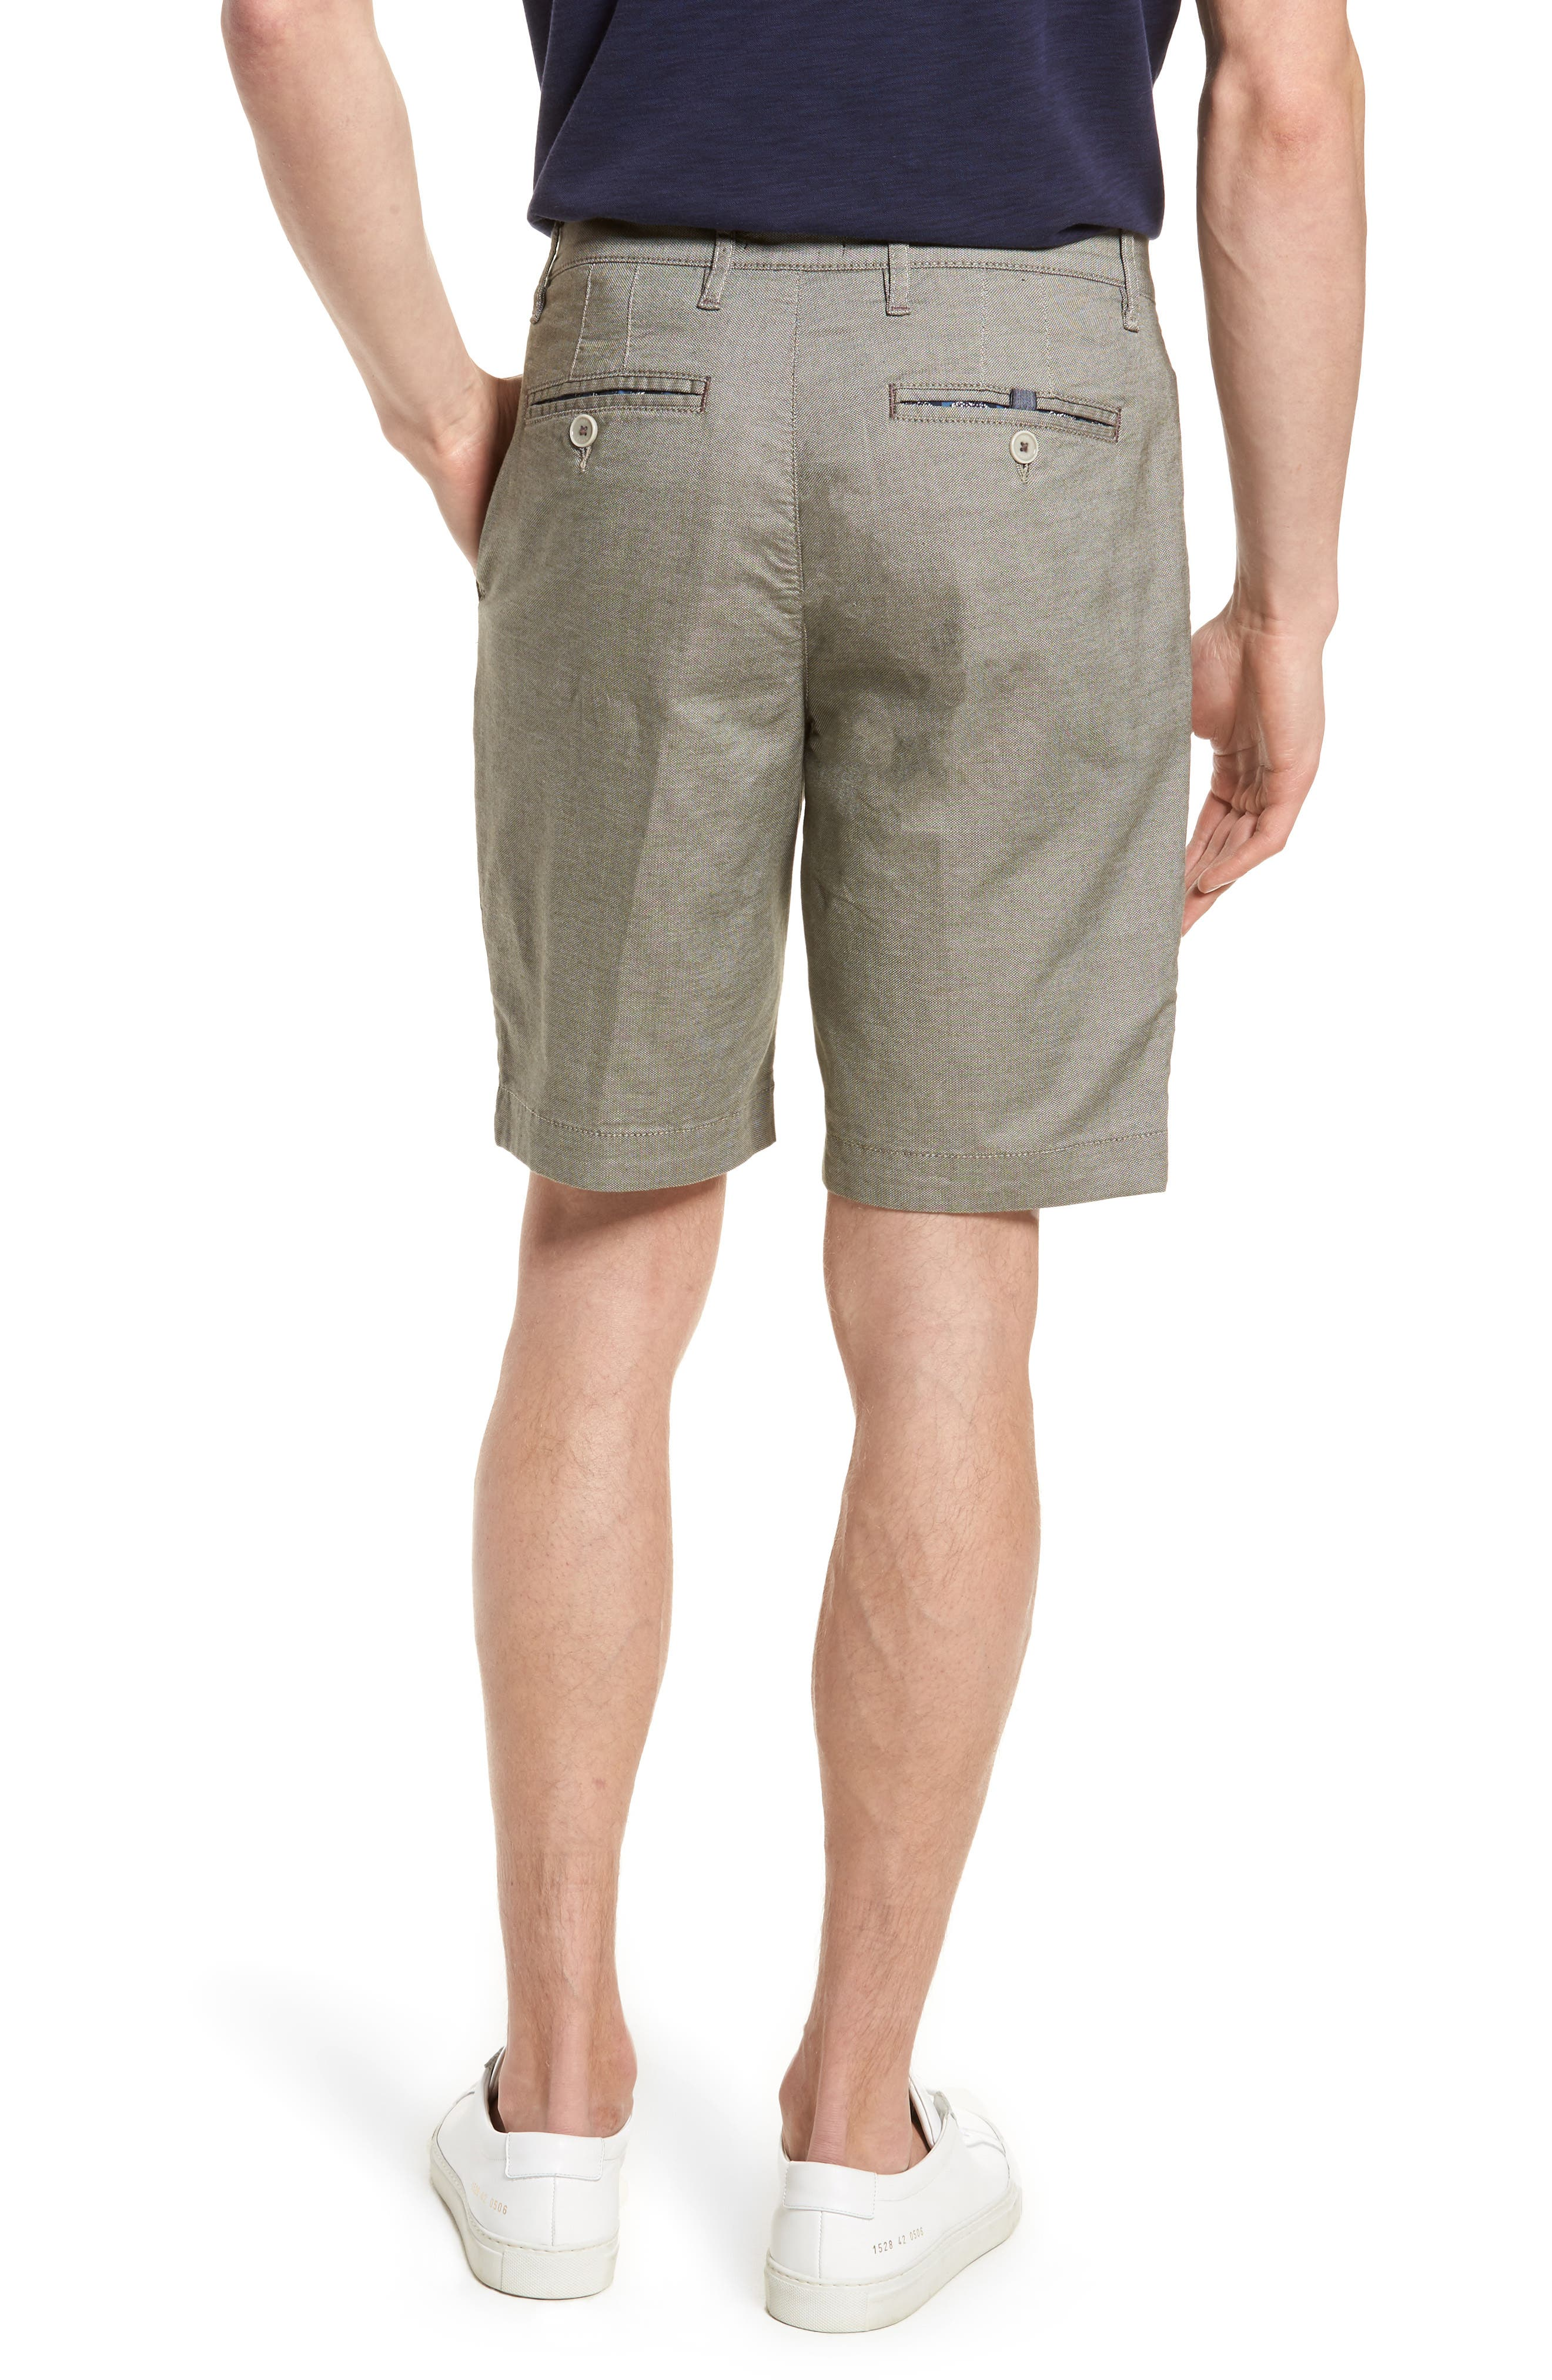 Herbosh Shorts,                             Alternate thumbnail 2, color,                             GREY MARL